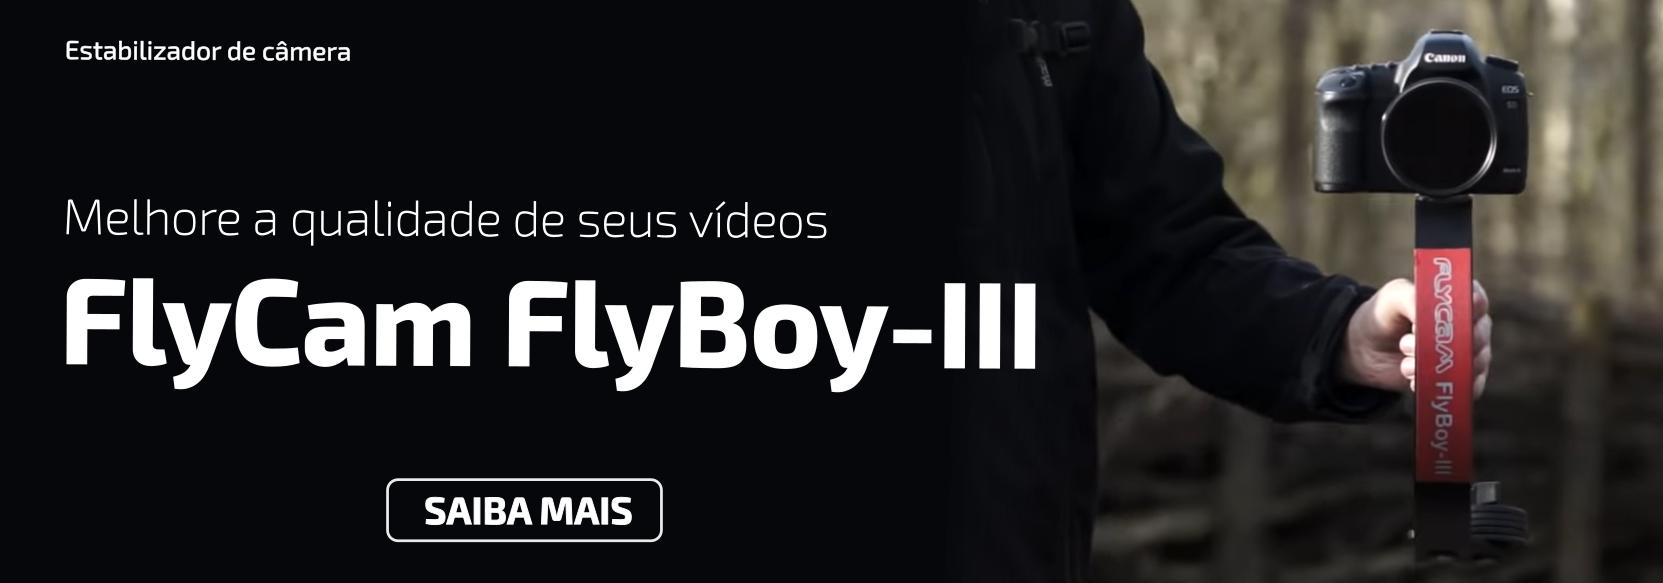 Flycam Flyboy III